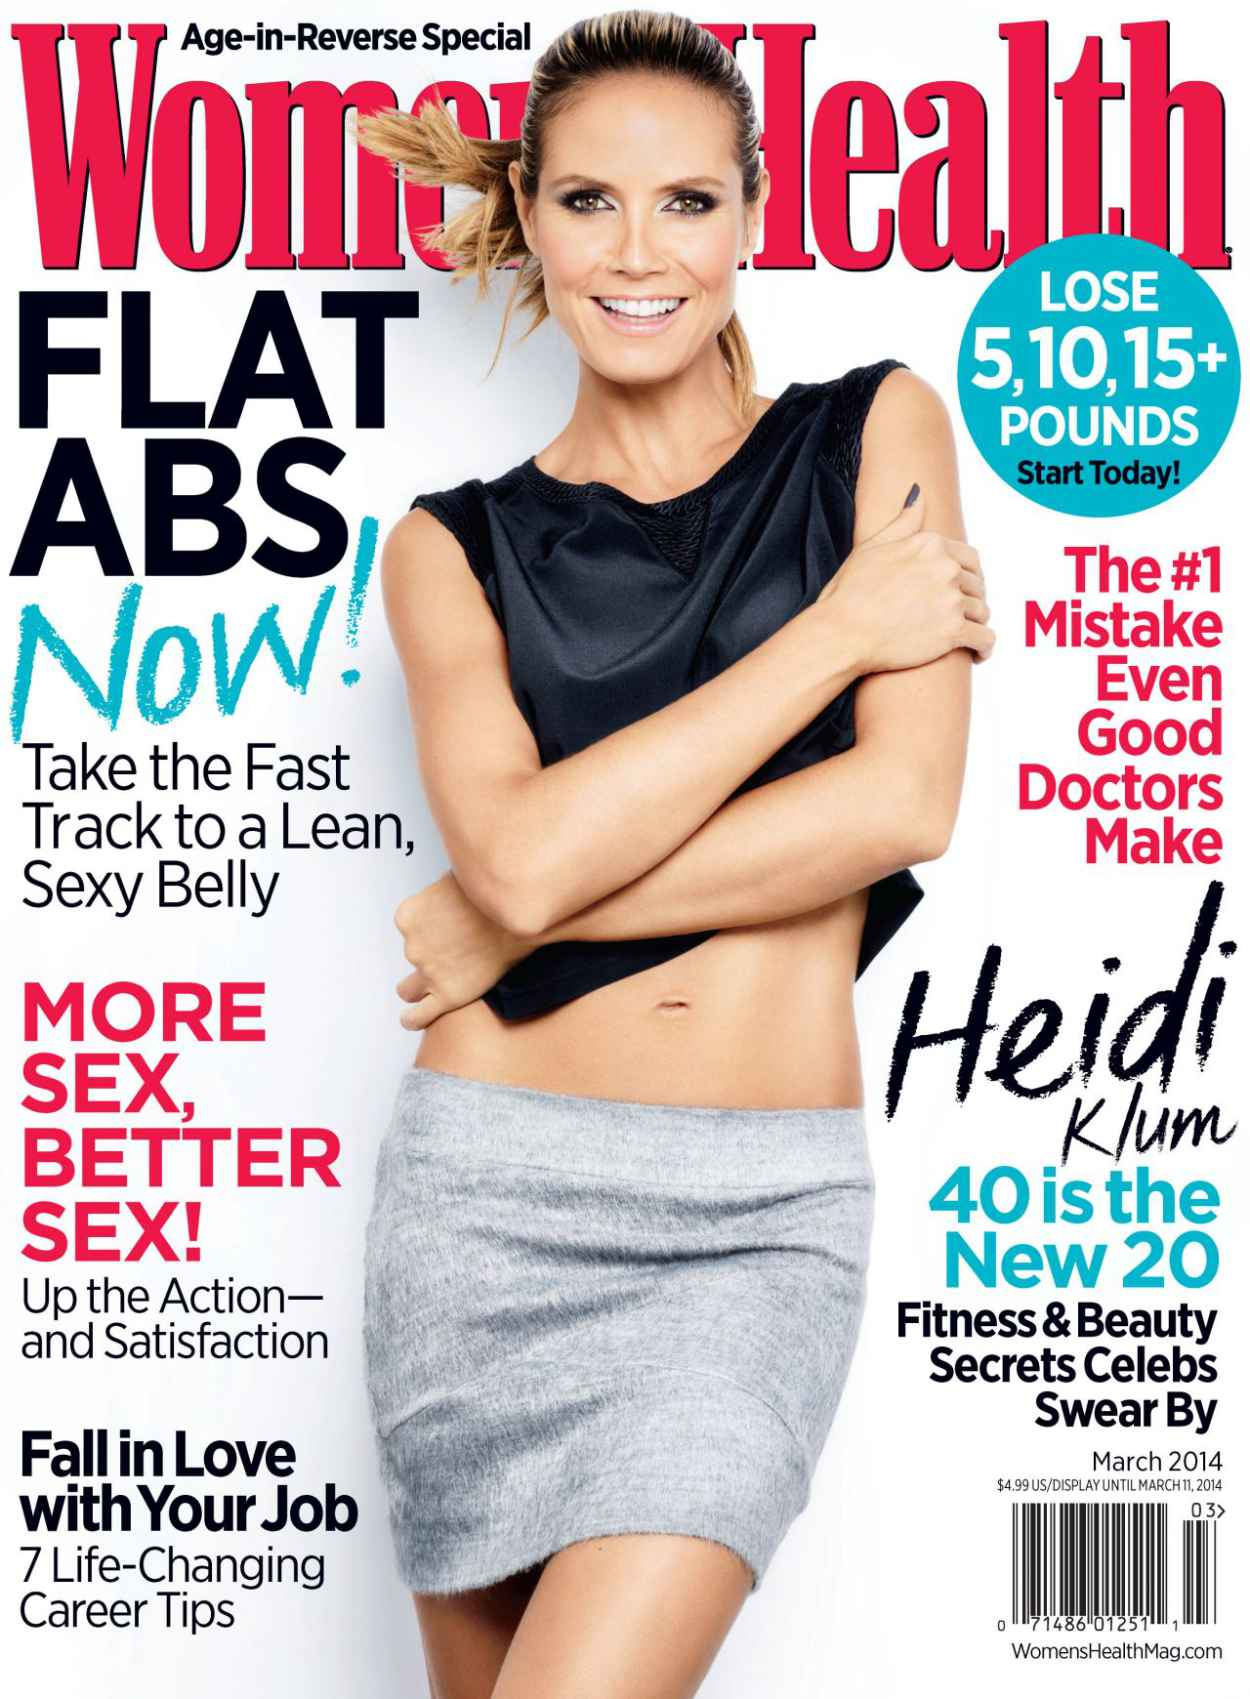 Heidi Klum - WOMENS HEALTH Magazine - March 2015 Cover-1